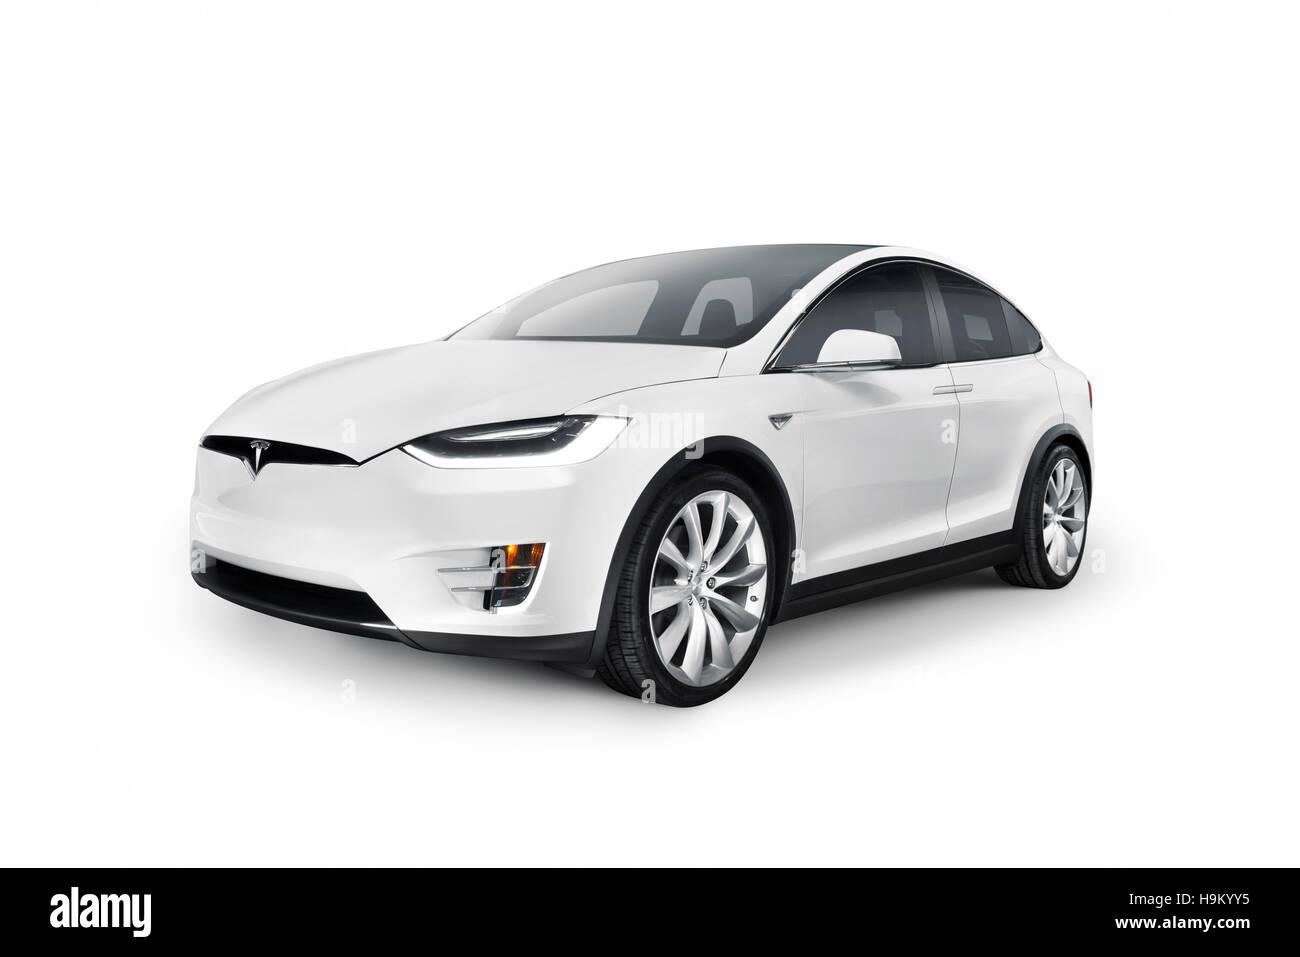 Weisse 2017 Tesla Model X Luxus Suv Elektroauto Stockfoto Bild